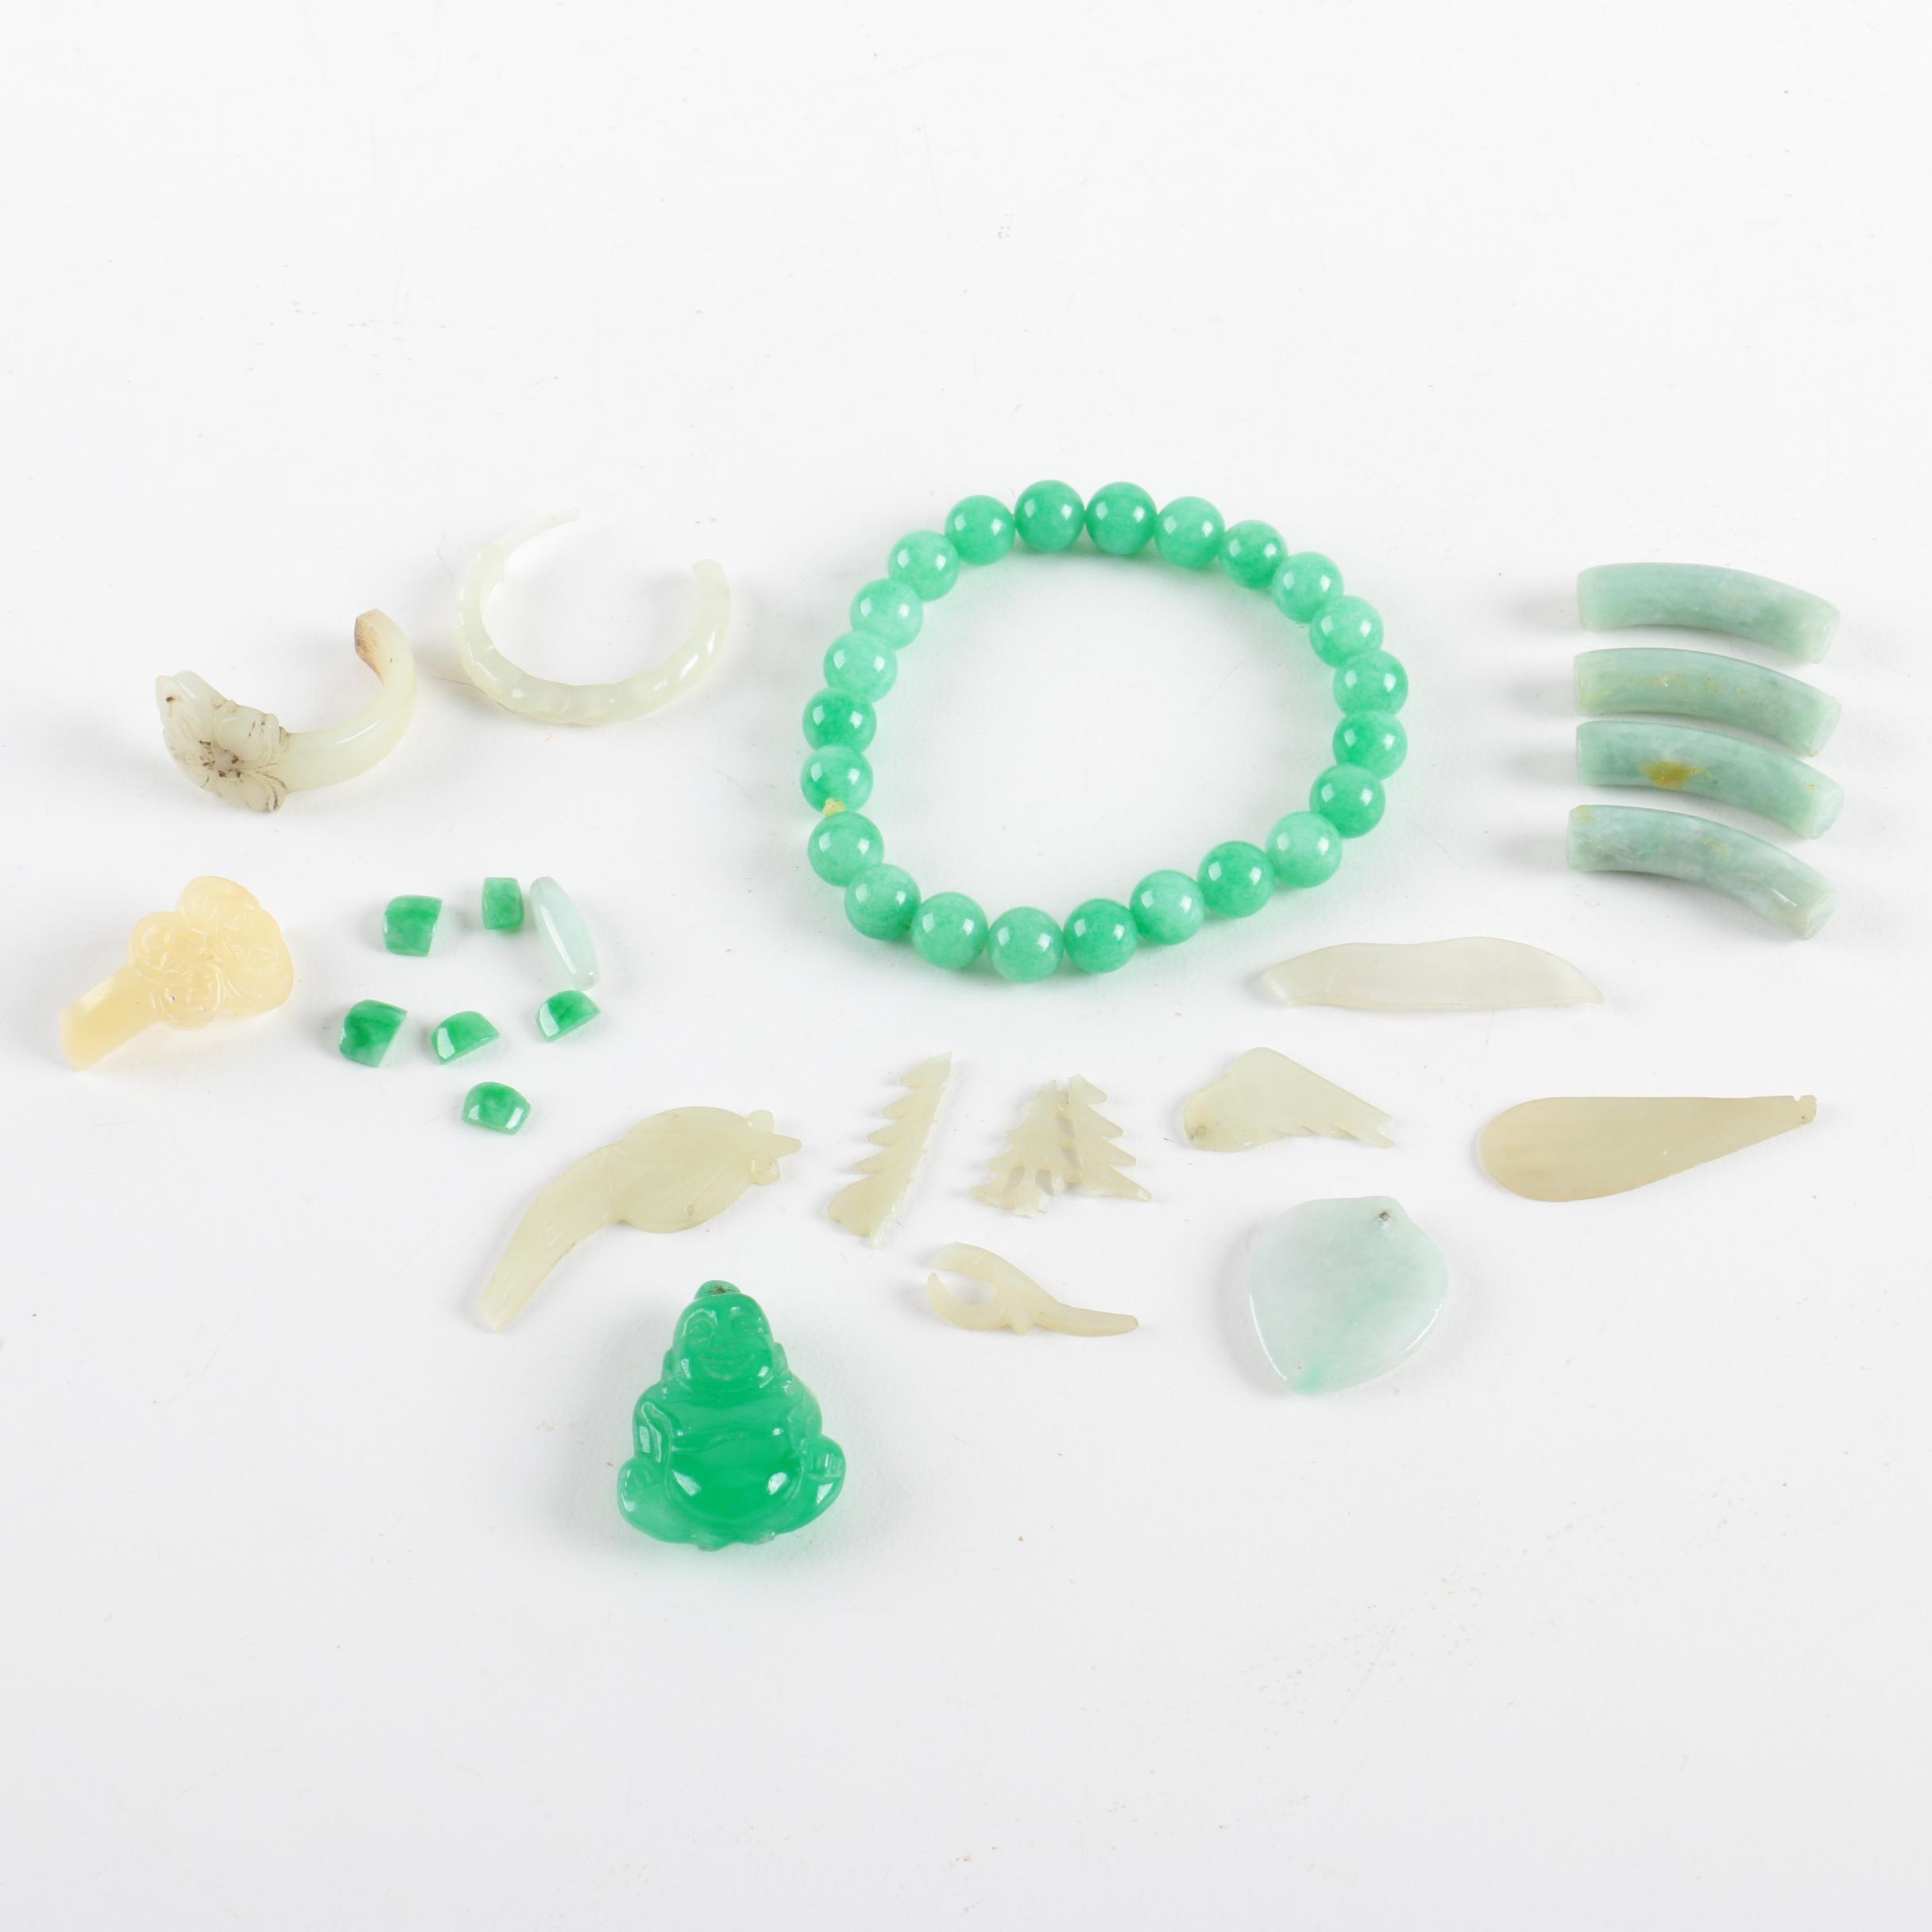 Jadeite Buddha Pendant, Quench Crackled Quartz Bracelet and Natural Stone Pieces